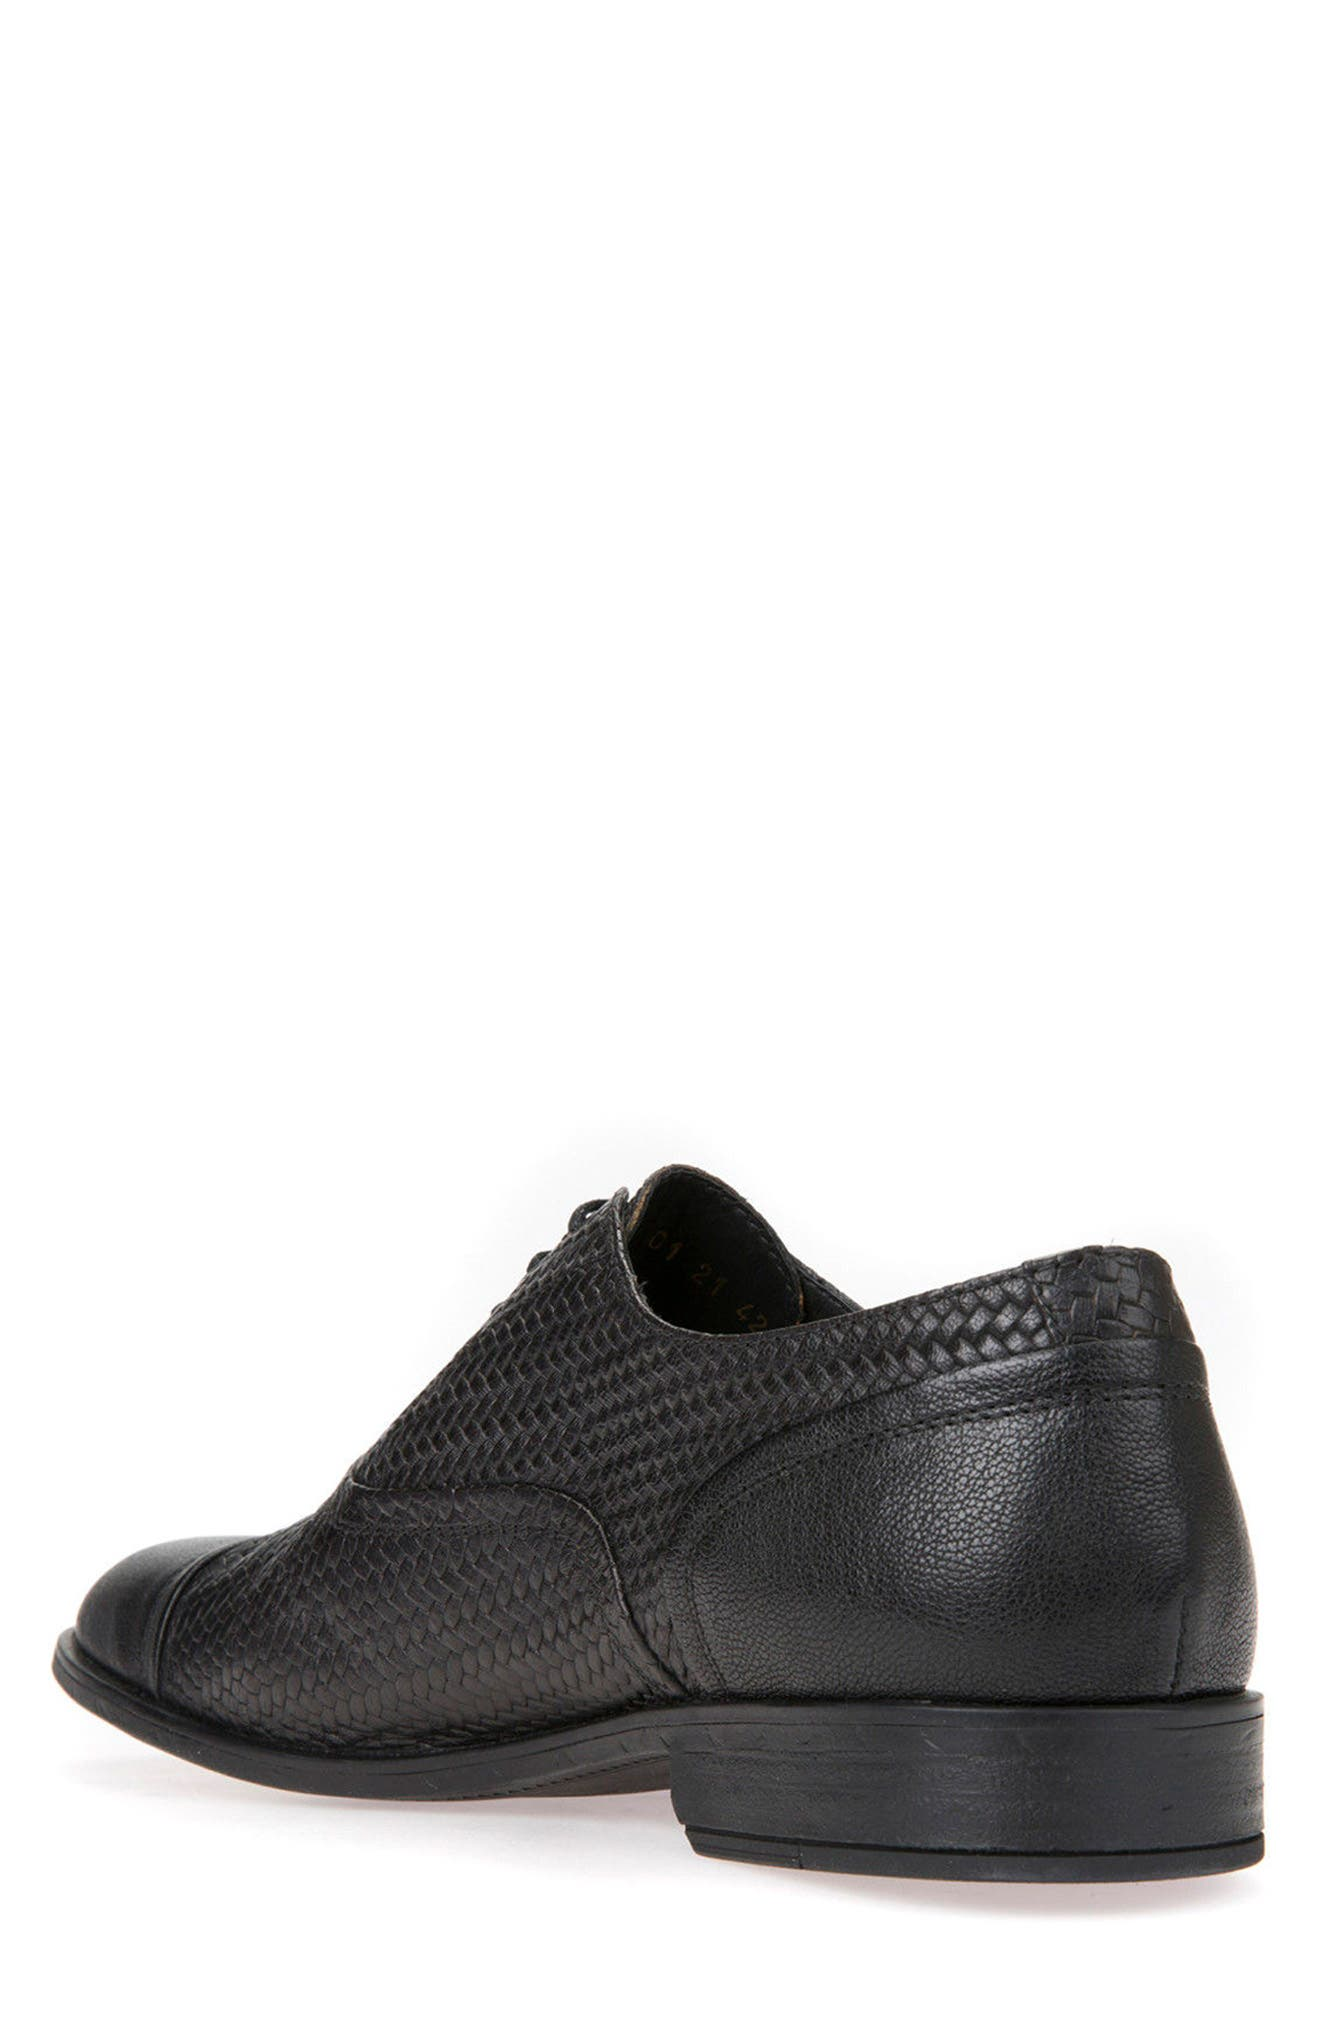 Bryceton Textured Cap Toe Oxford,                             Alternate thumbnail 2, color,                             BLACK LEATHER